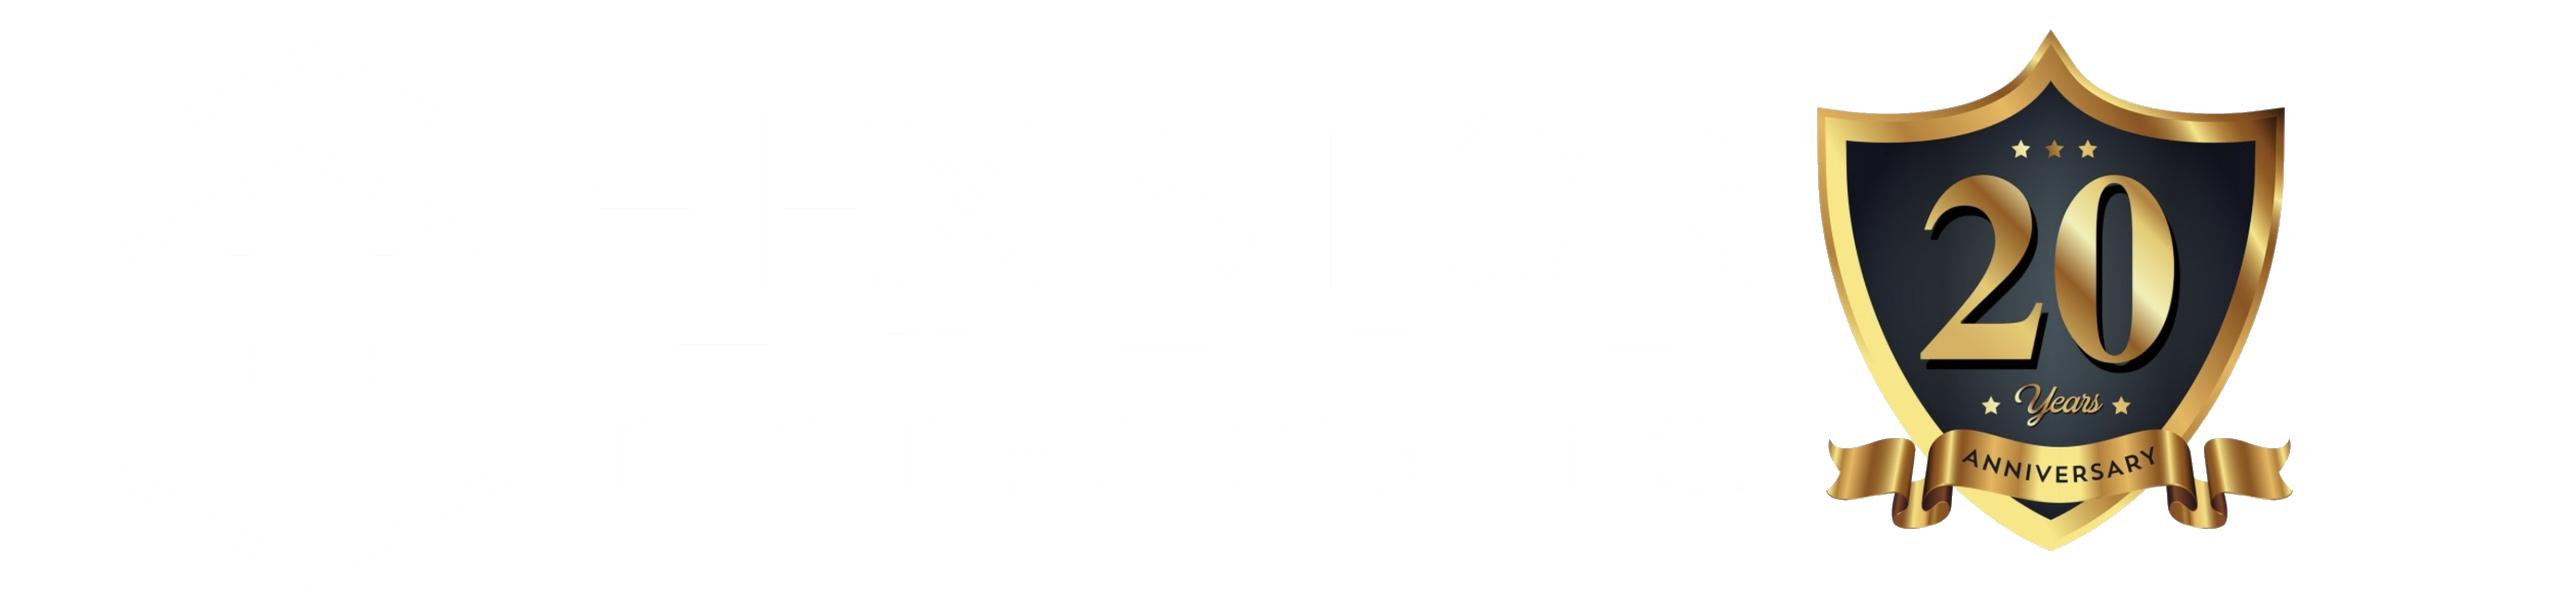 Hexistor International Data Protection Services Logo